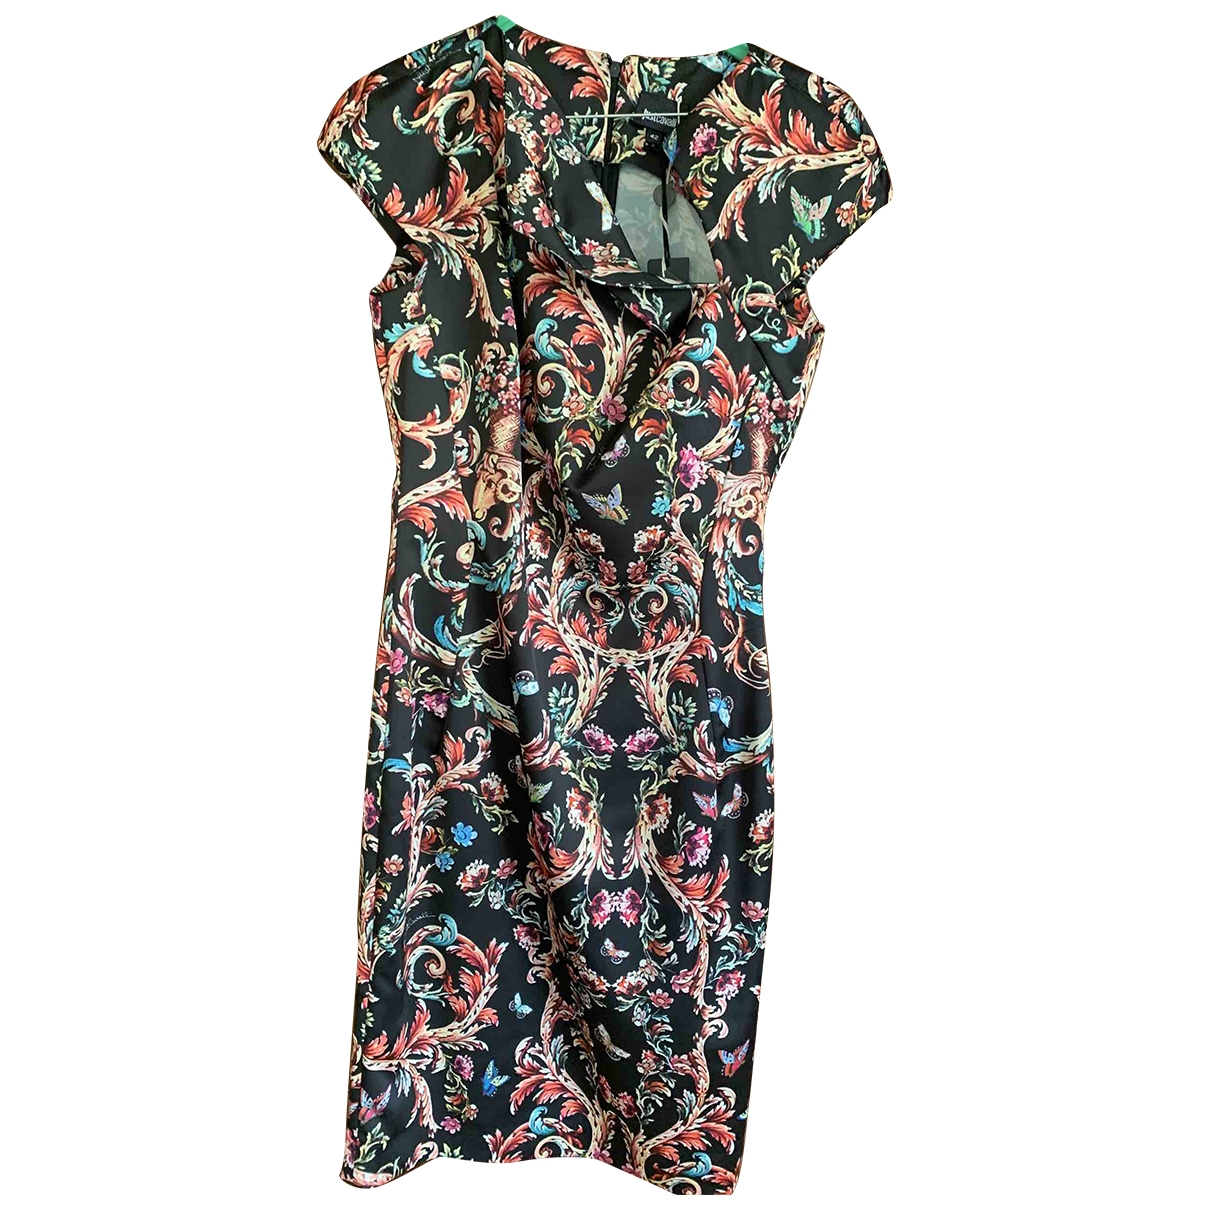 Just Cavalli \N dress for Women 42 IT